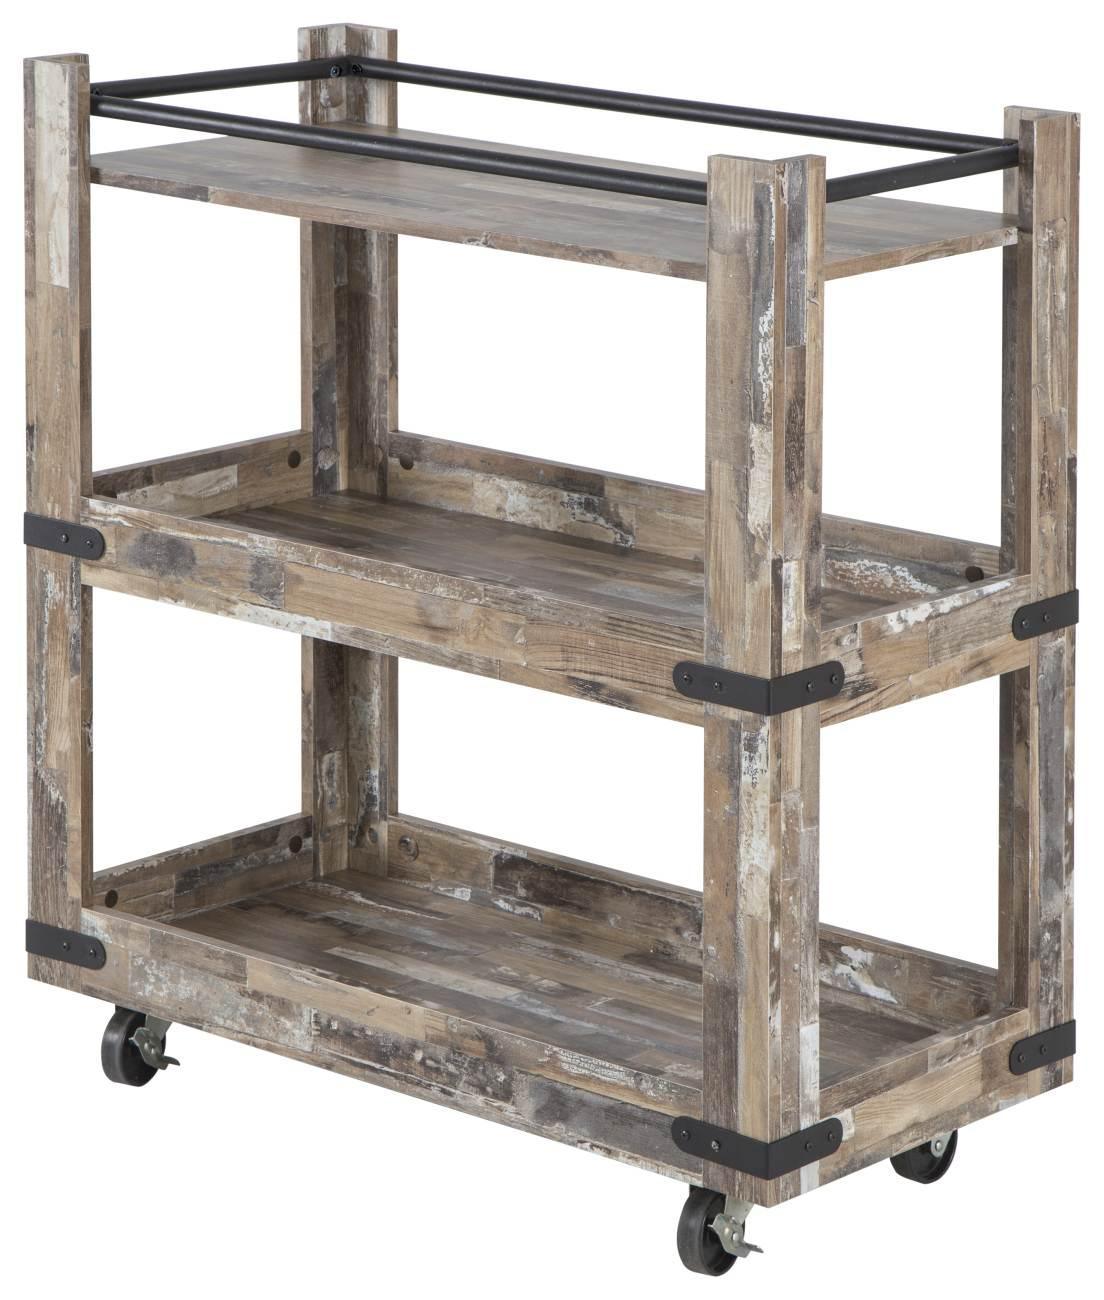 servierwagen factory 110 x 64 cm driftwood nachbildung. Black Bedroom Furniture Sets. Home Design Ideas